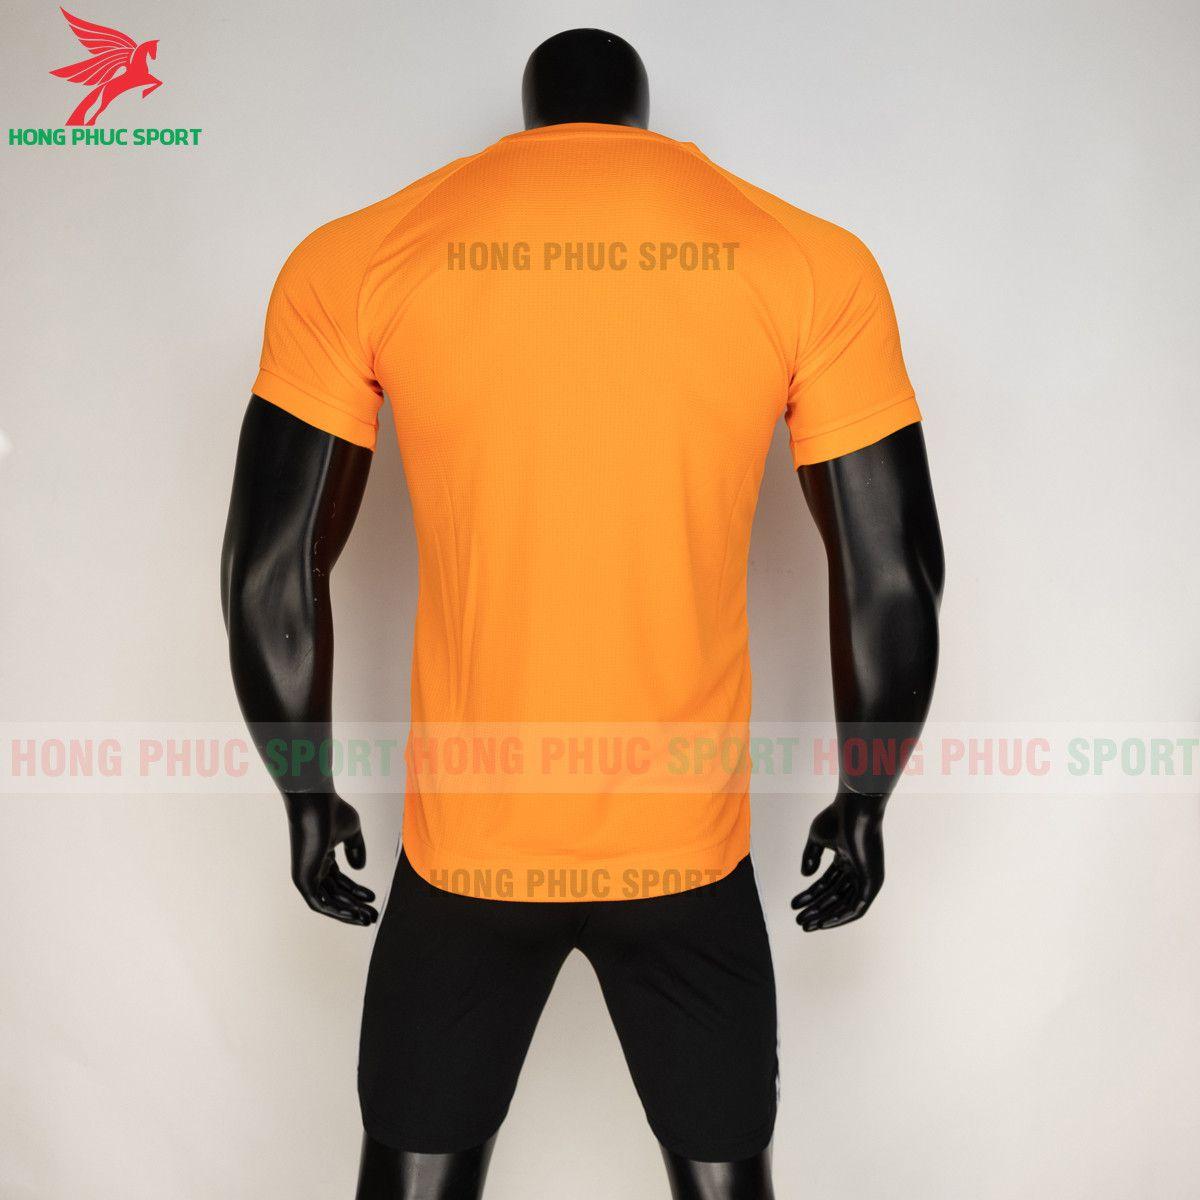 https://cdn.hongphucsport.com/unsafe/s4.shopbay.vn/files/285/ao-bong-da-training-man-utd-2020-21-mau-cam-thailand-6155832f6b2ab.jpg